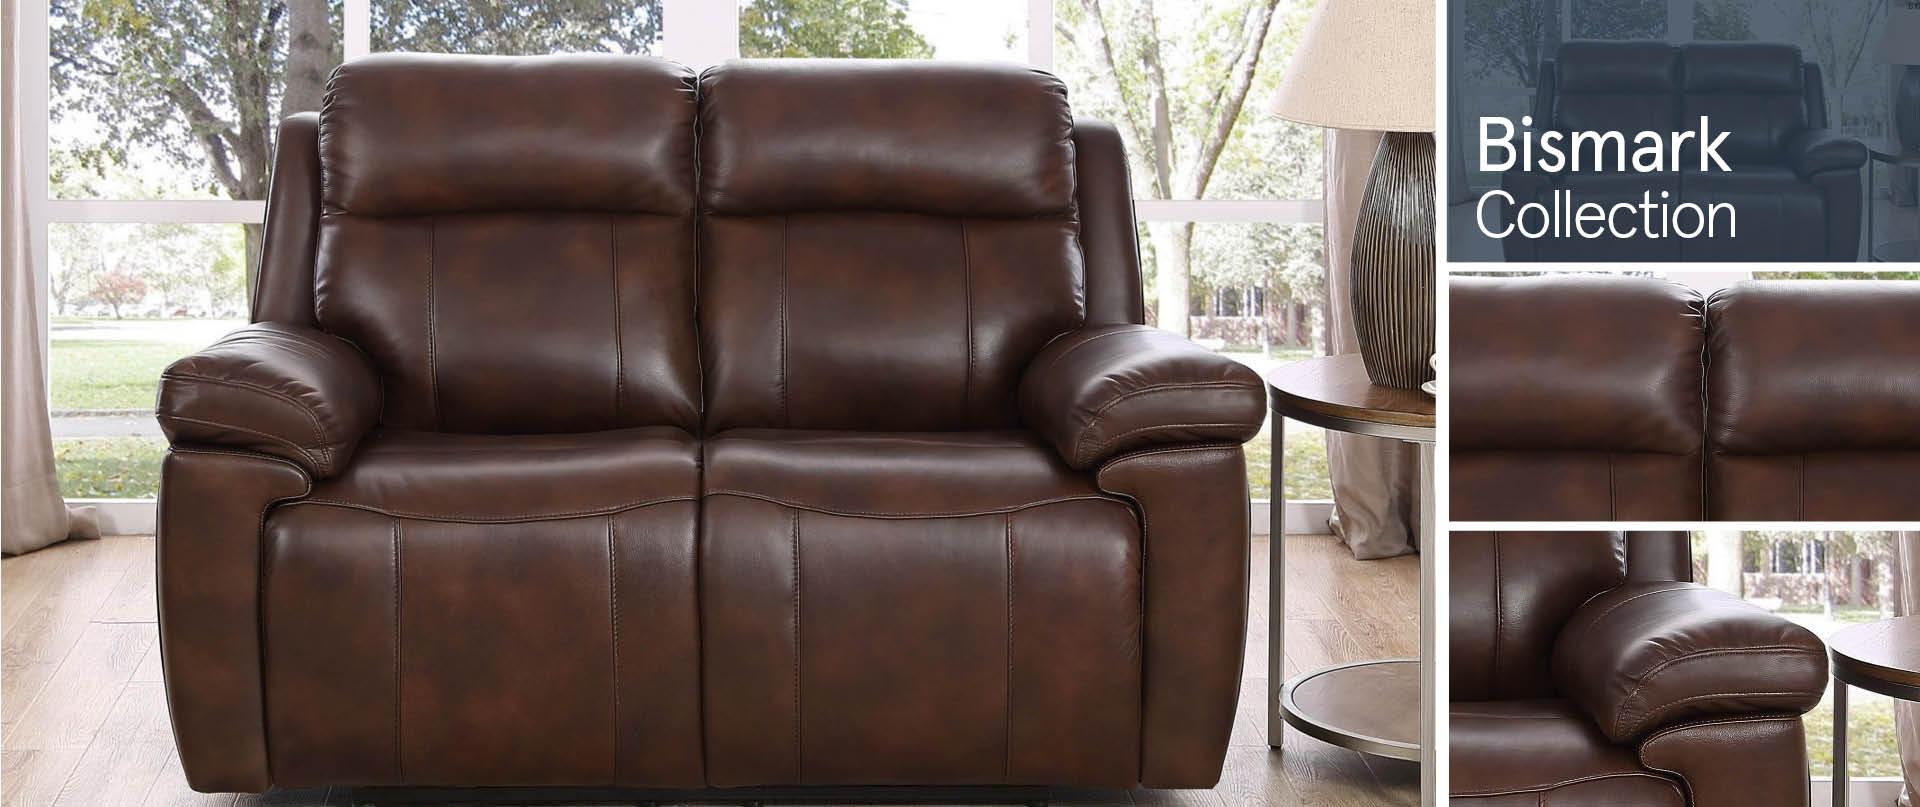 Bismark Leather Sofa Ranges